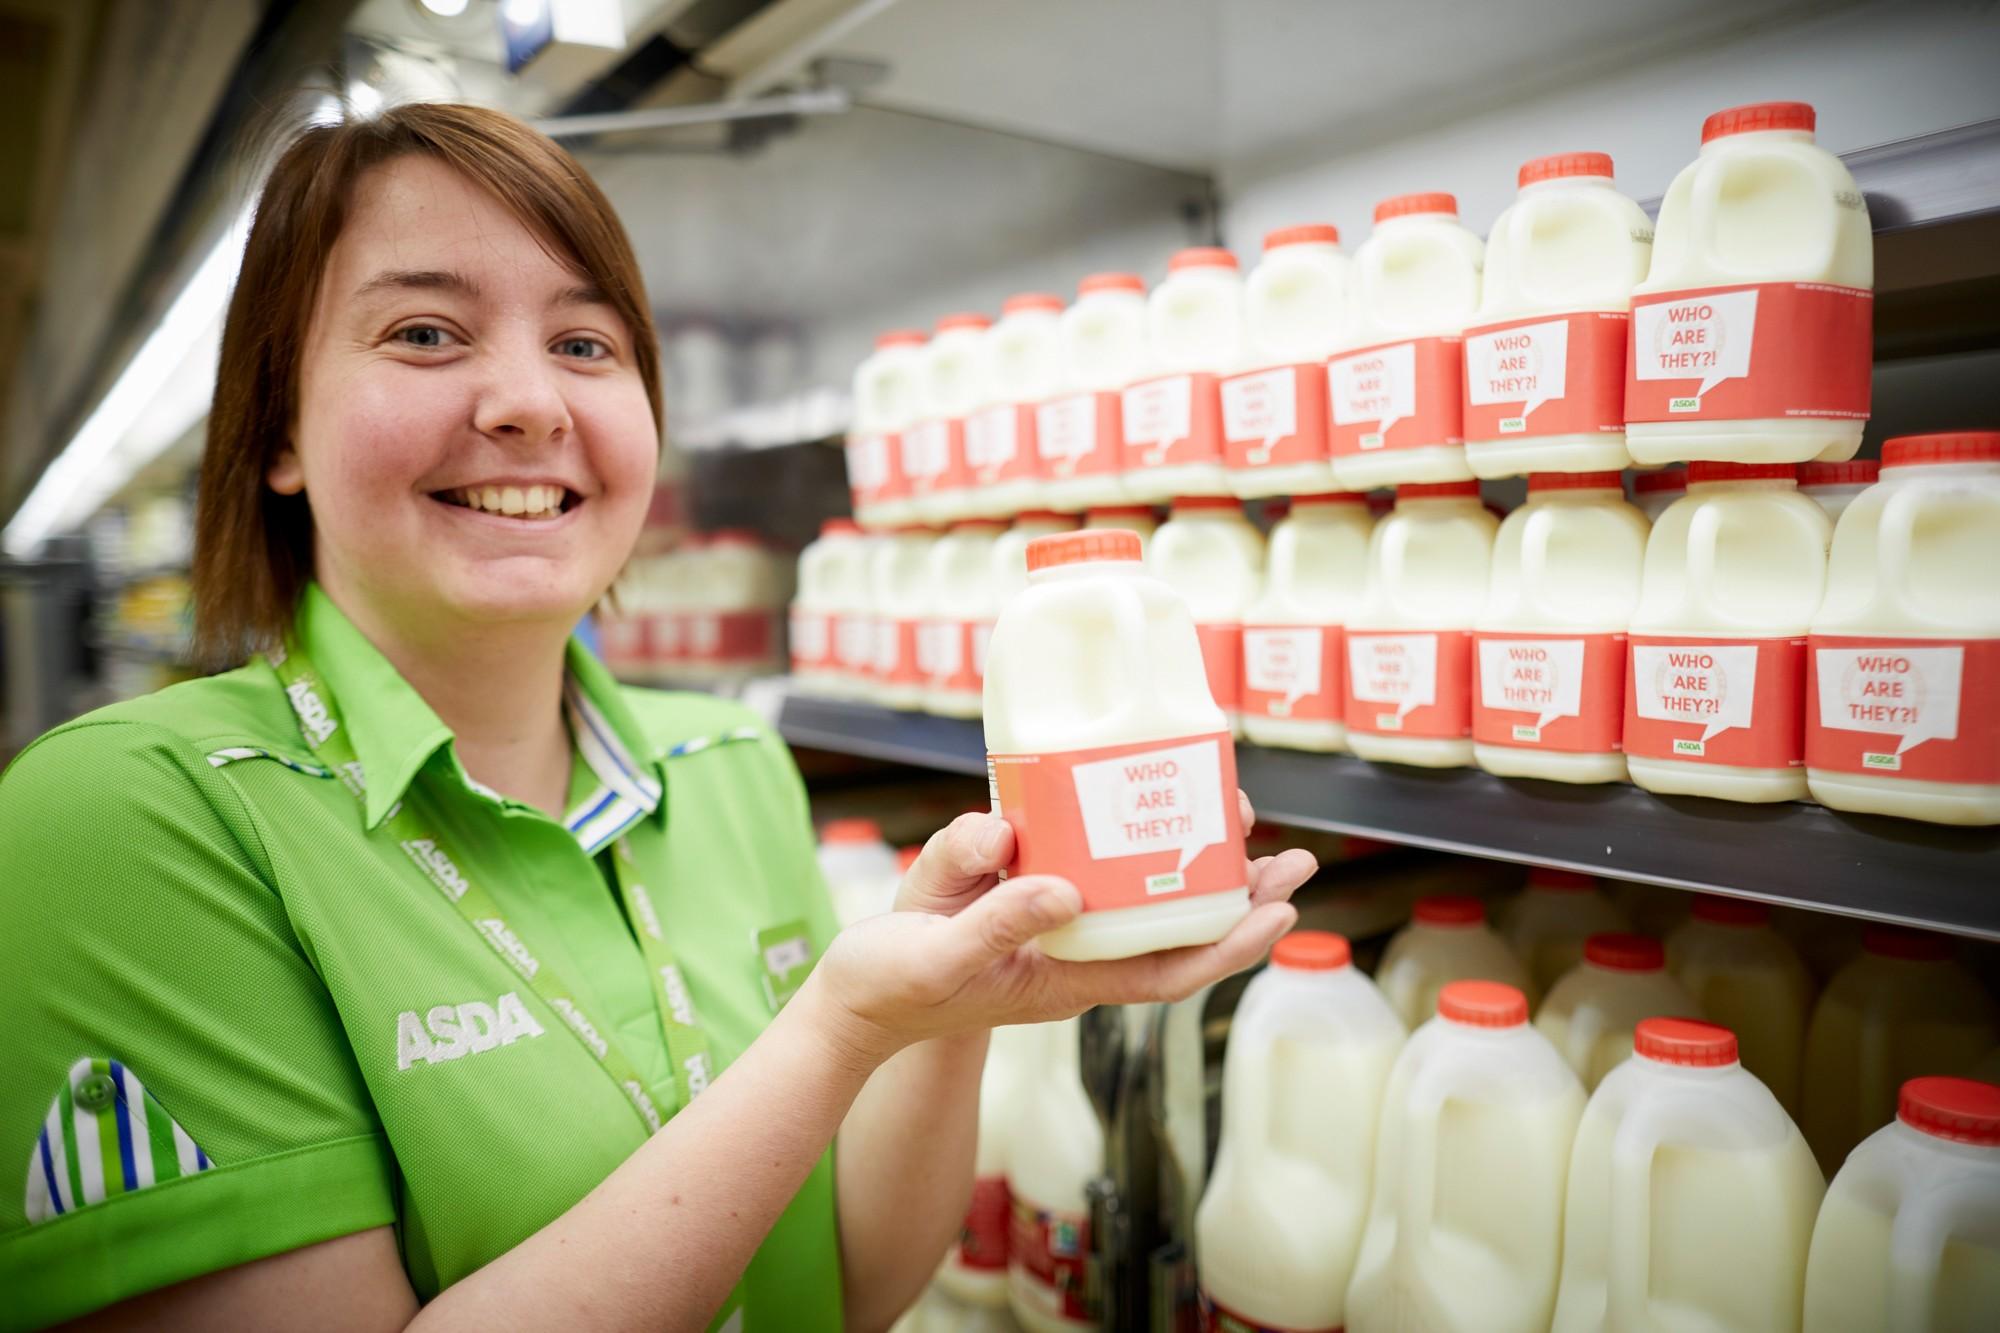 "Asda Accrington's celebratory ""Who are they?"" milk"